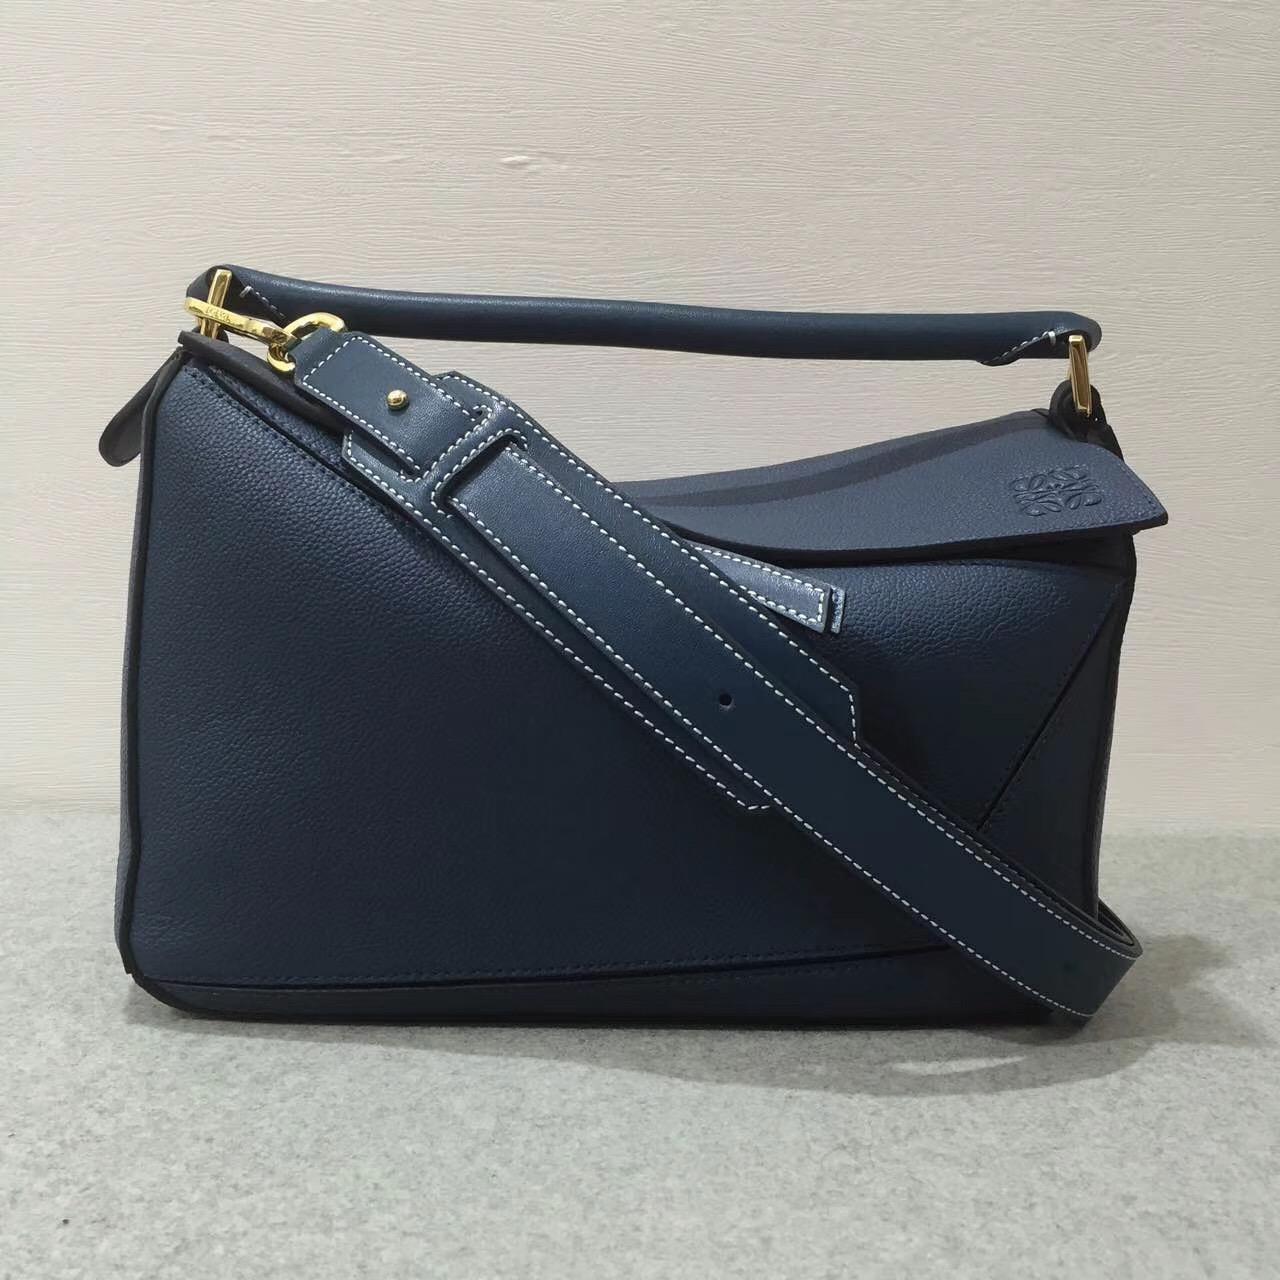 Loewe羅意威中號幾何包 Puzzle Bag 顆粒小牛皮靛蓝色